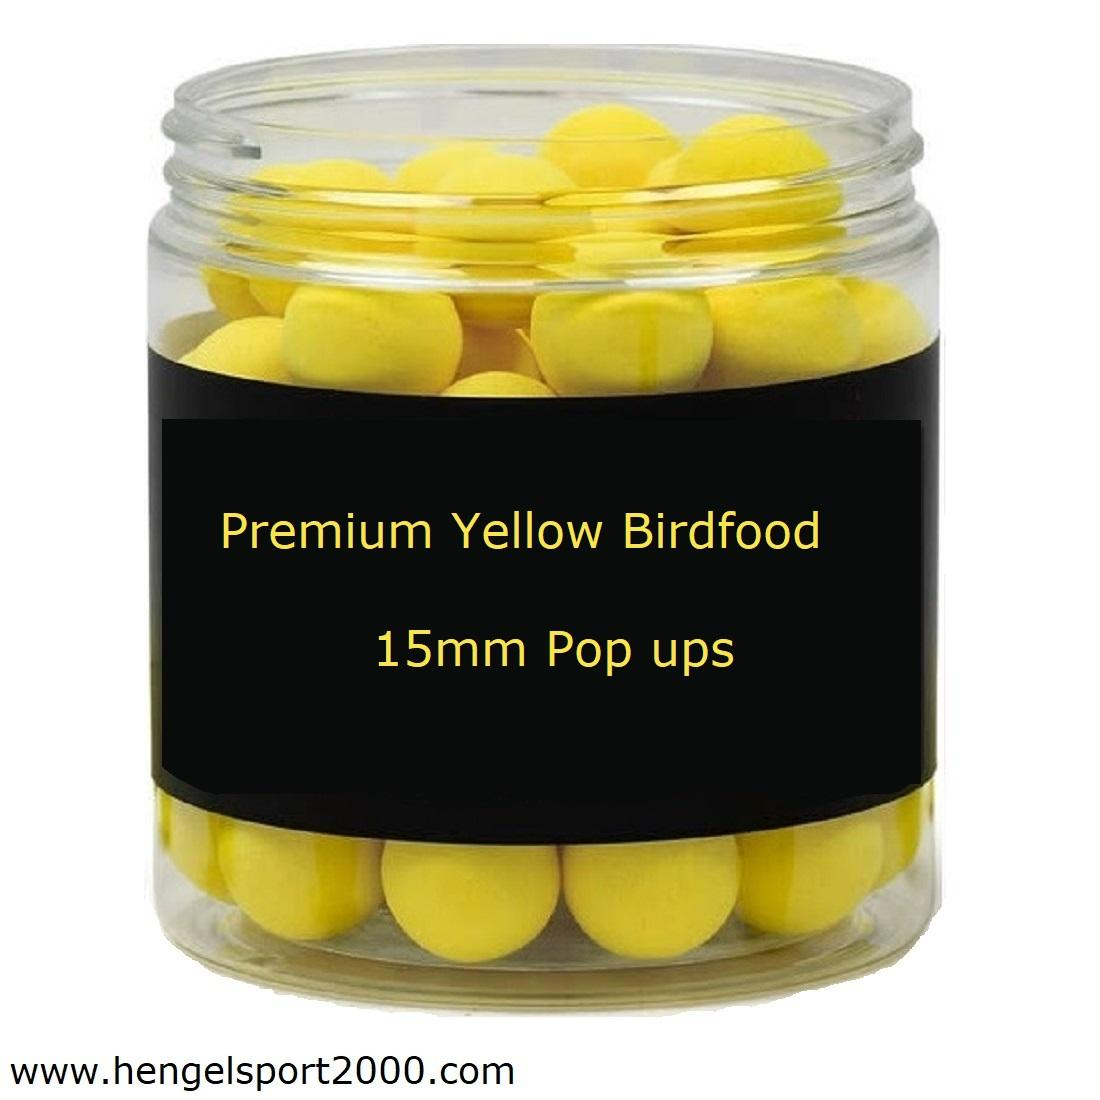 Premium Yellow Birdfood Pop ups